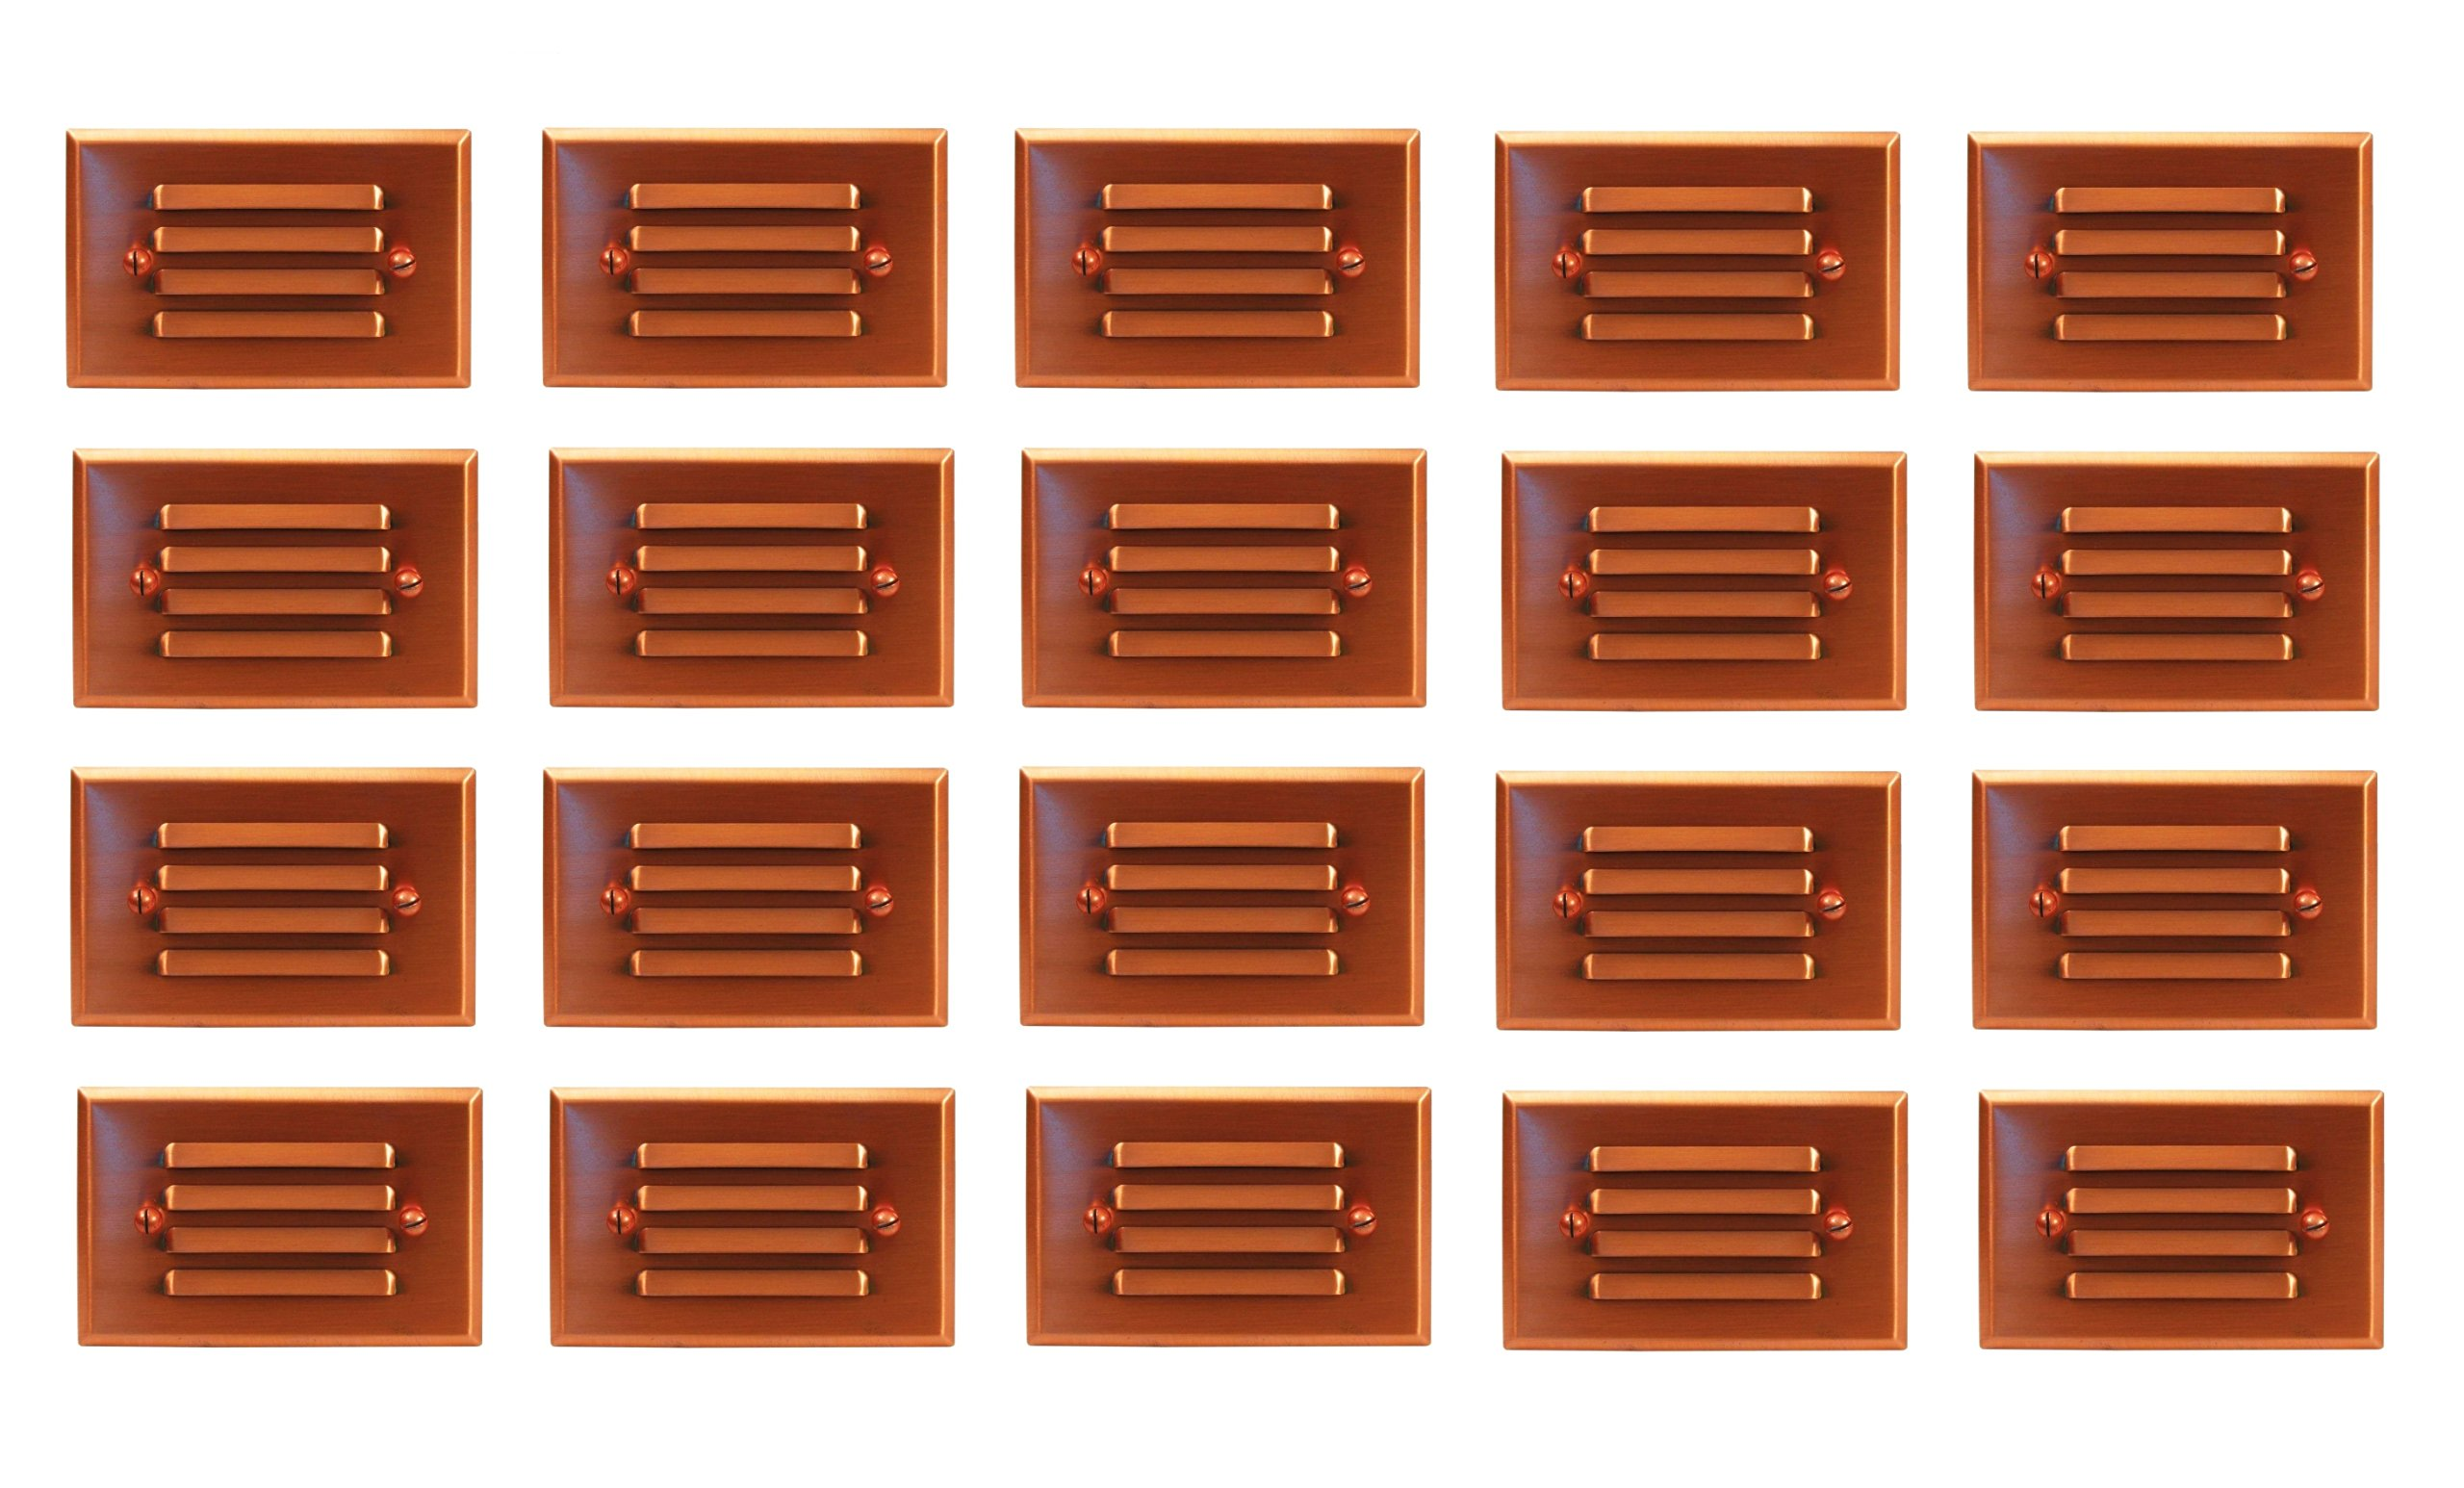 20 Pack Malibu 8421-2401-20 LED Half Brick Outdoor Deck Step Light Copper Finish BY MALIBU DISTRIBUTION by Malibu